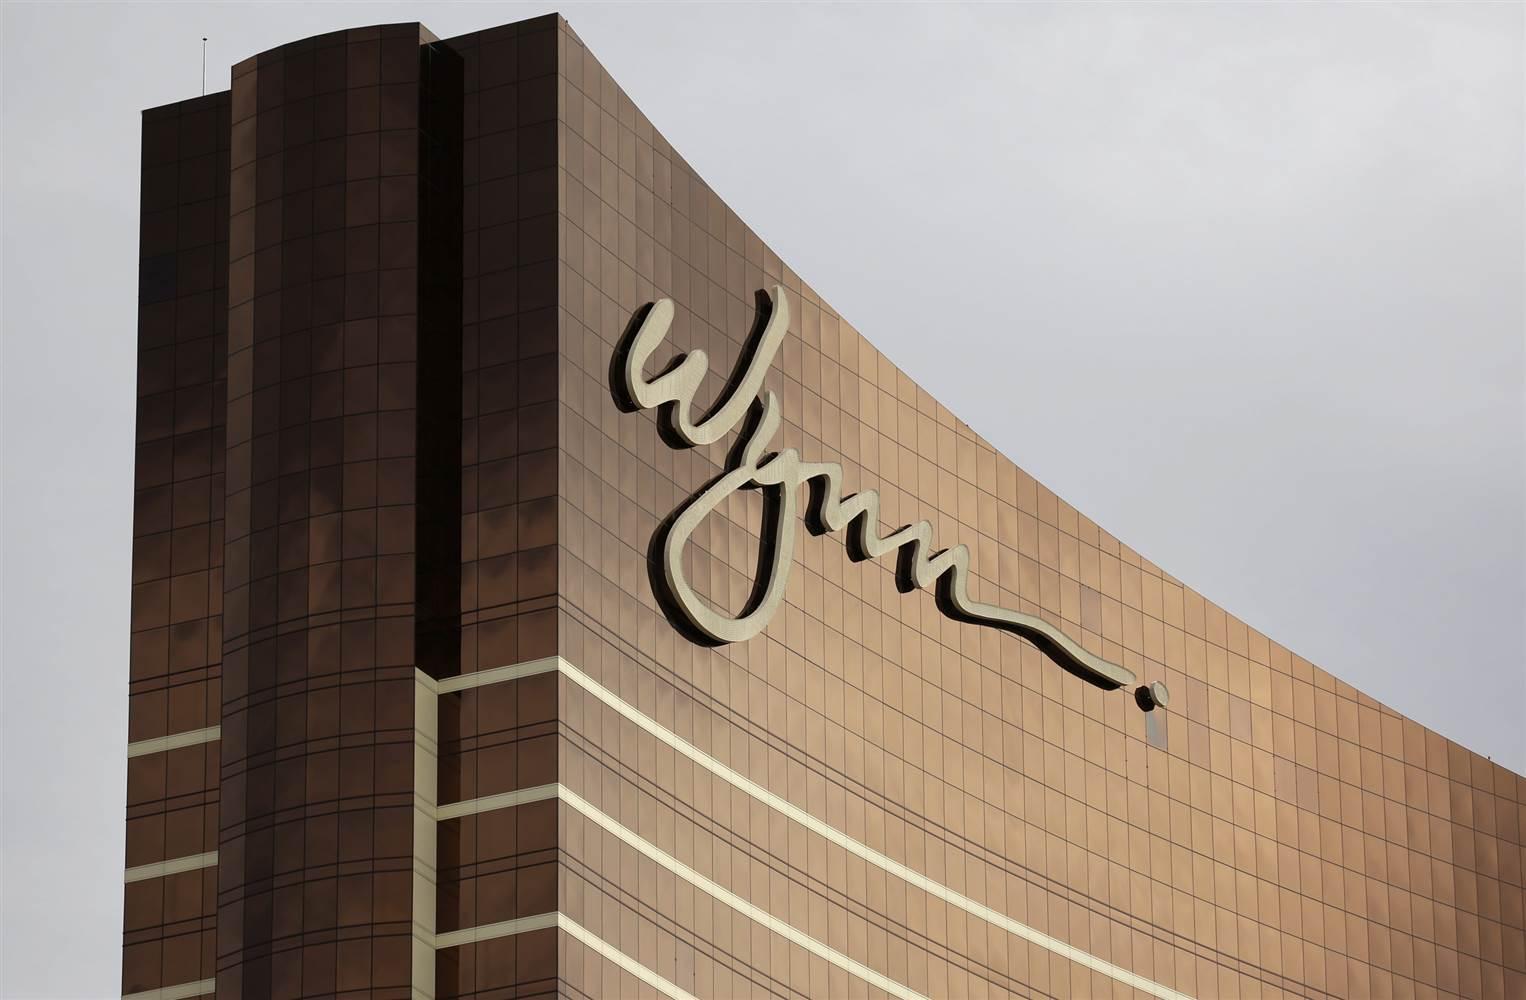 Steve Wynn Sells Shares